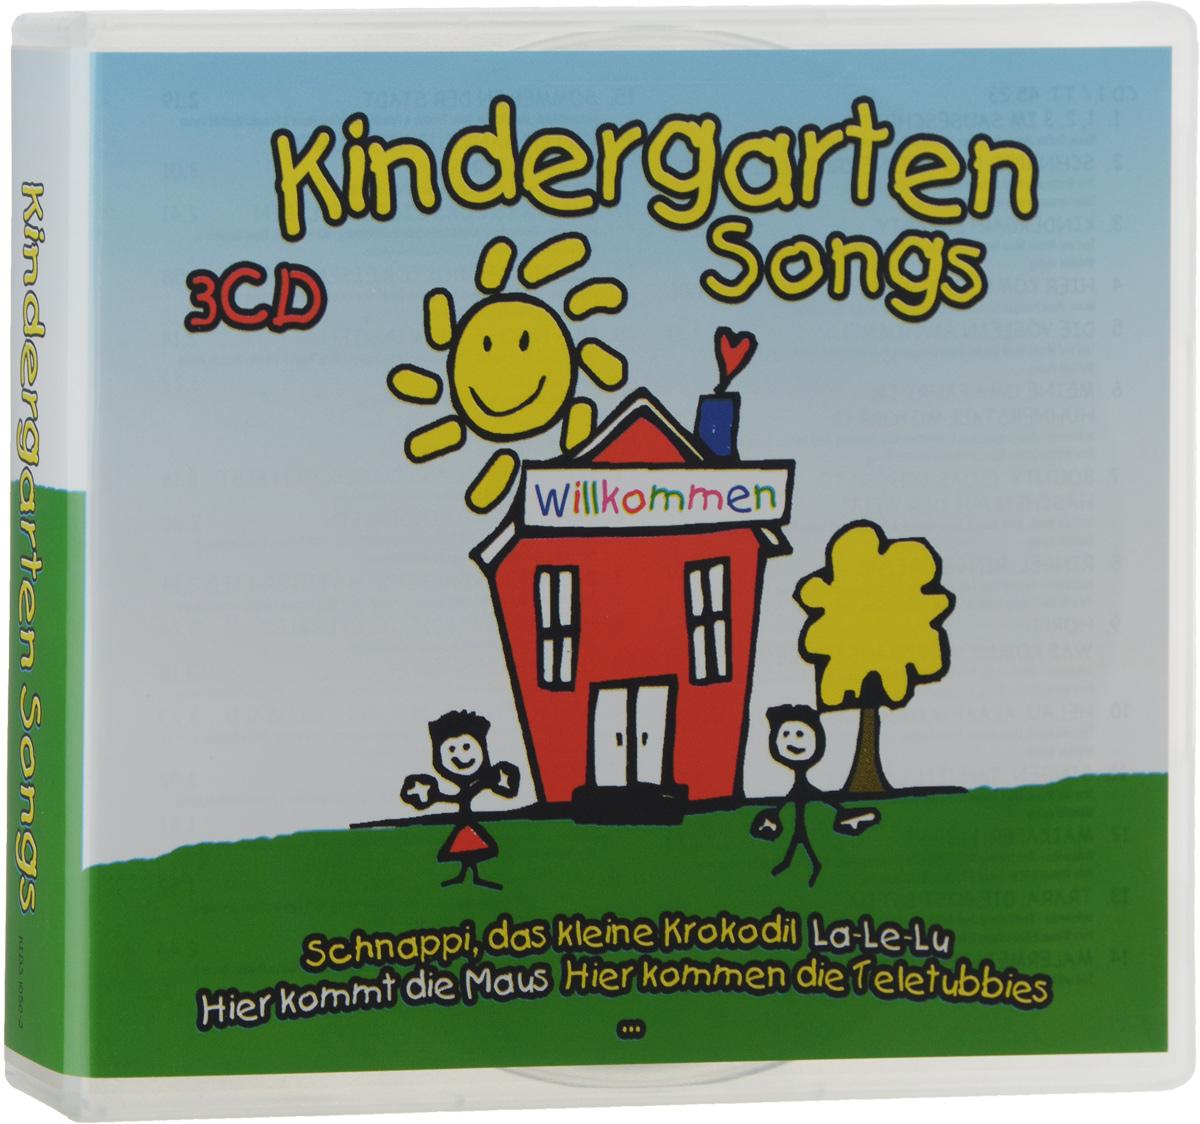 Kindergarten Songs (3 CD) eng adventure 4 songs cd x 1